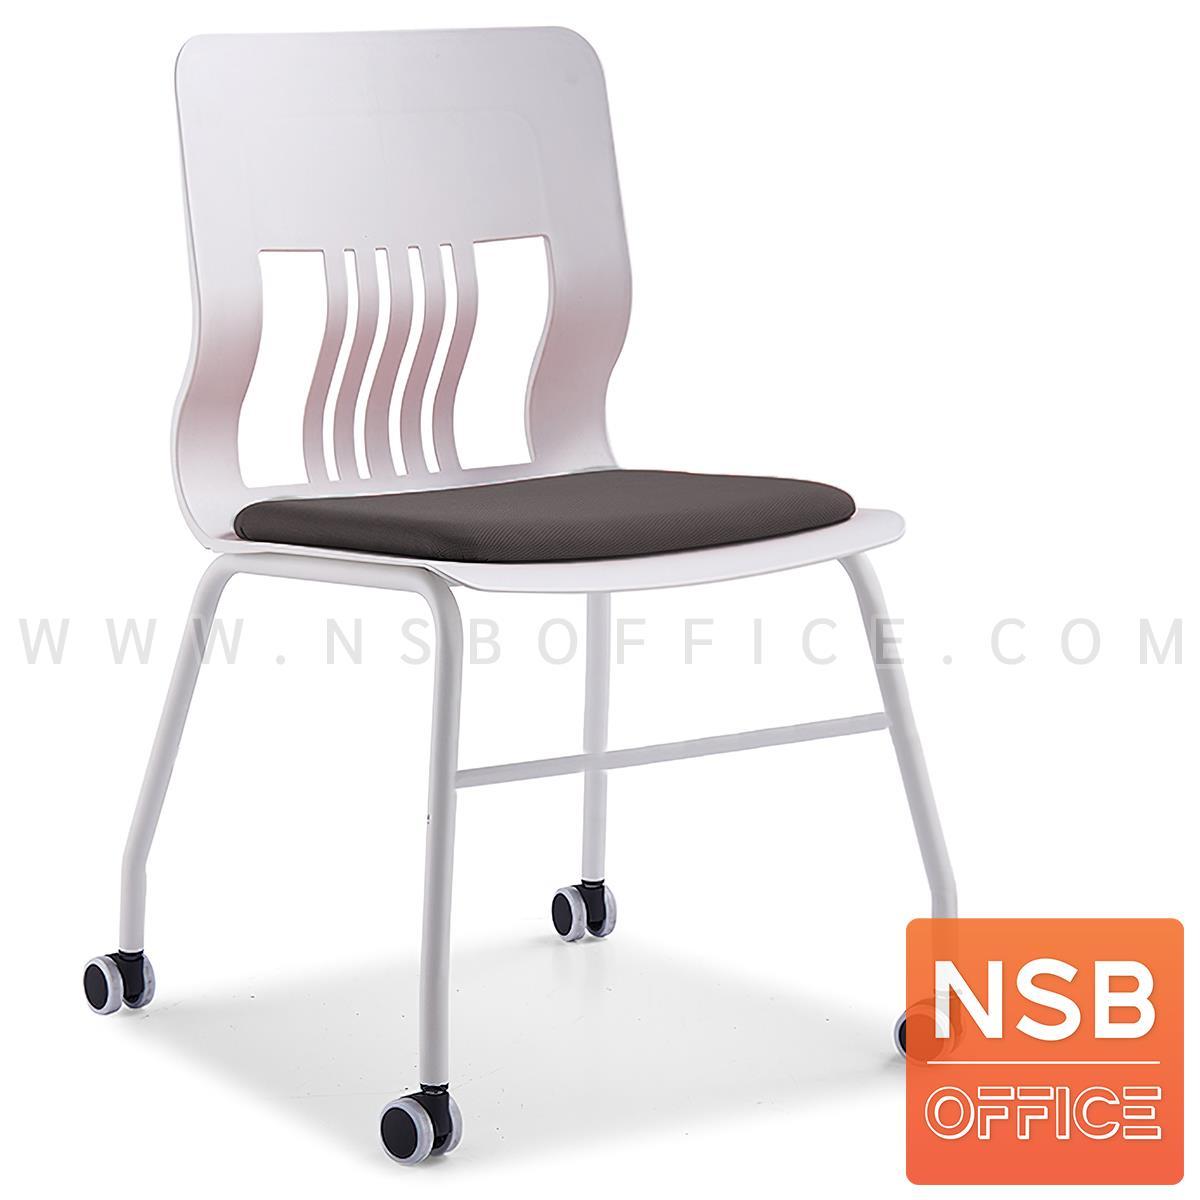 B05A172:เก้าอี้อเนกประสงค์เฟรมโพลี่ล้อเลื่อน รุ่น Chaucer (ชอเซอร์) ซ้อนเก็บได้